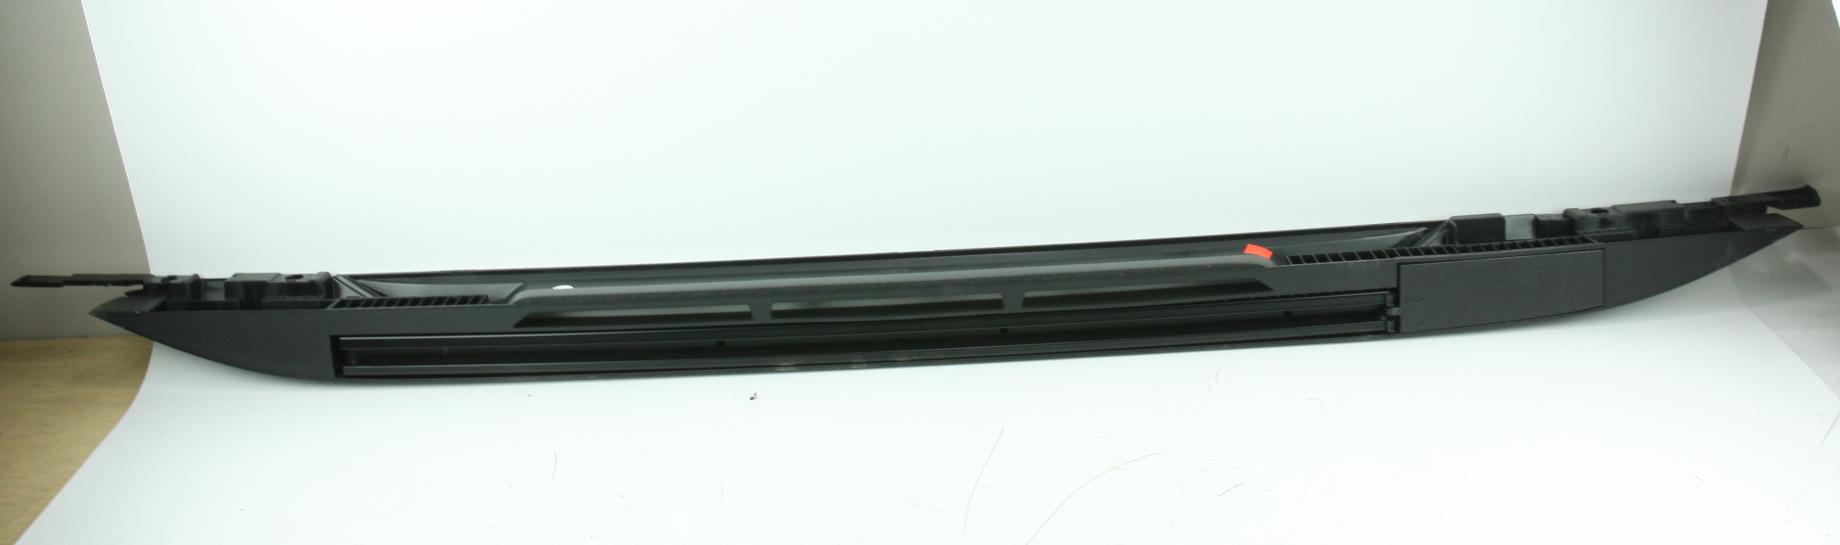 *** New Genuine OEM 23324213 GM Roof Rack Luggage Carrier Side Rail LH 84016250 - image 1